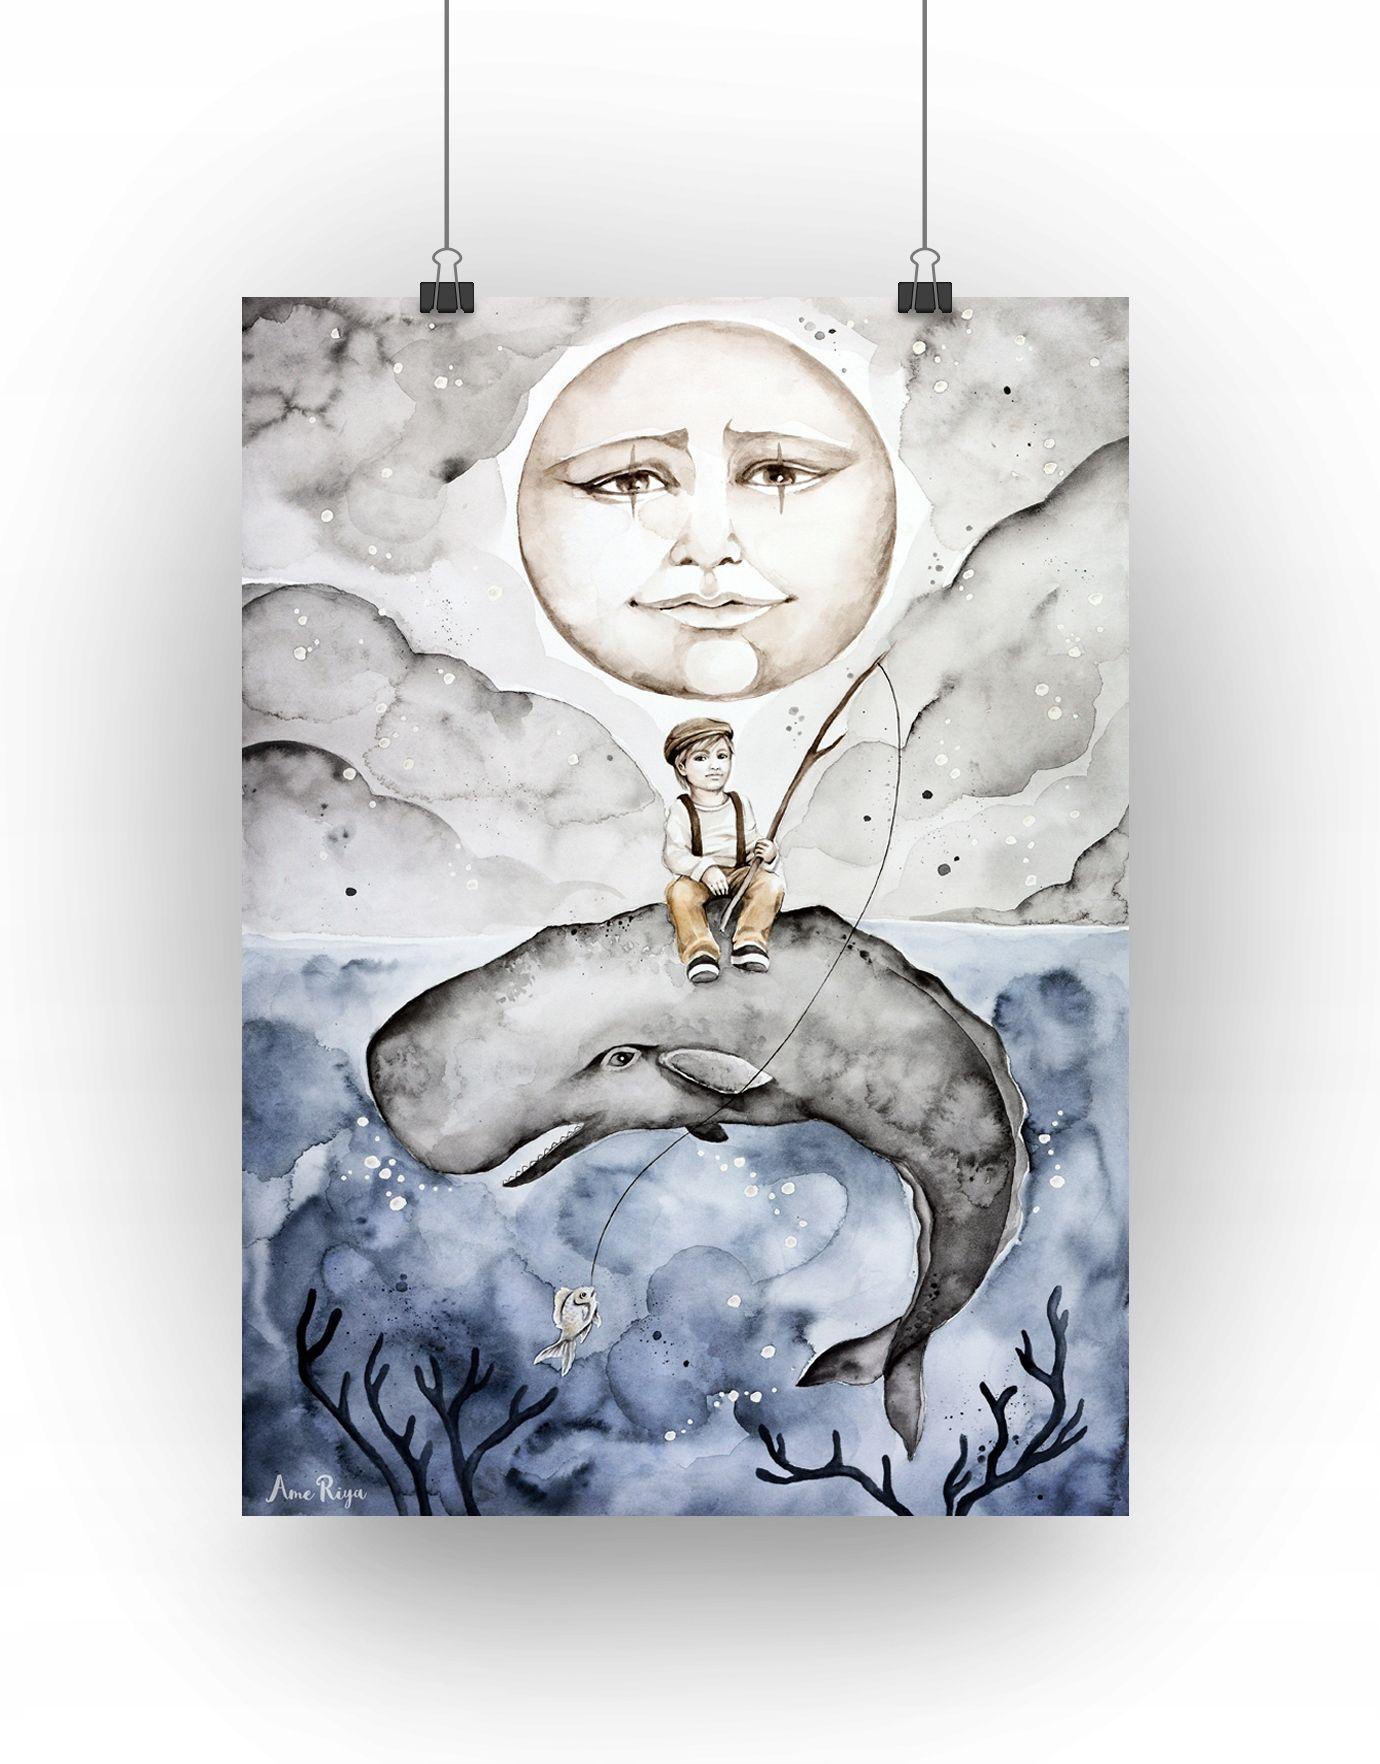 Plakat Sen O Wielorybie Chlopiec Format A3 7654053821 Oficjalne Archiwum Allegro Kids Room Male Sketch Humanoid Sketch